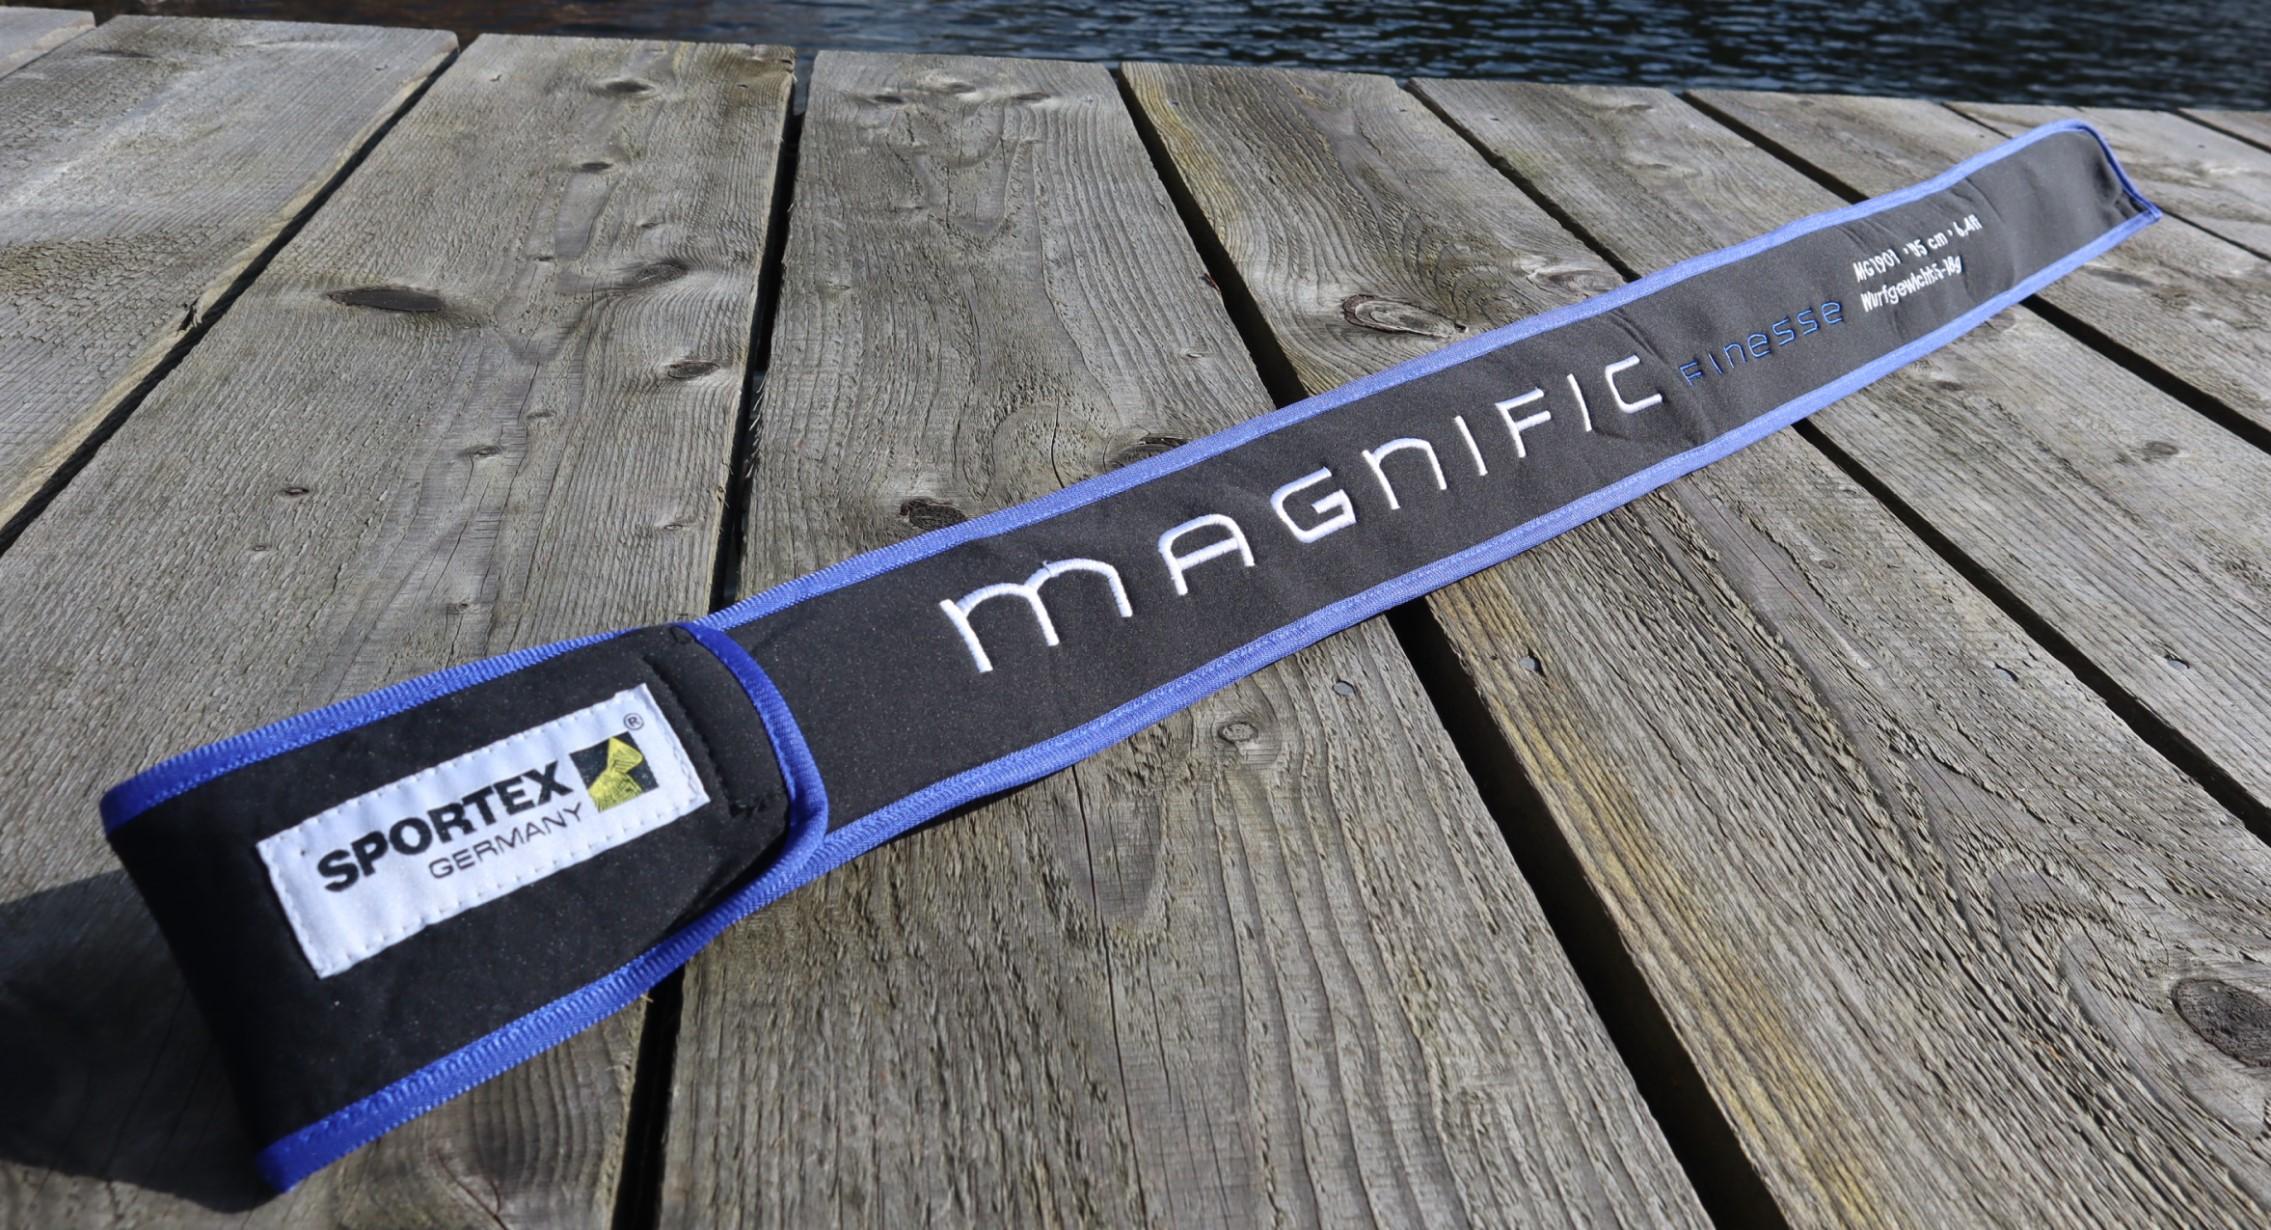 Sportex Magnifix Finesse.jpg